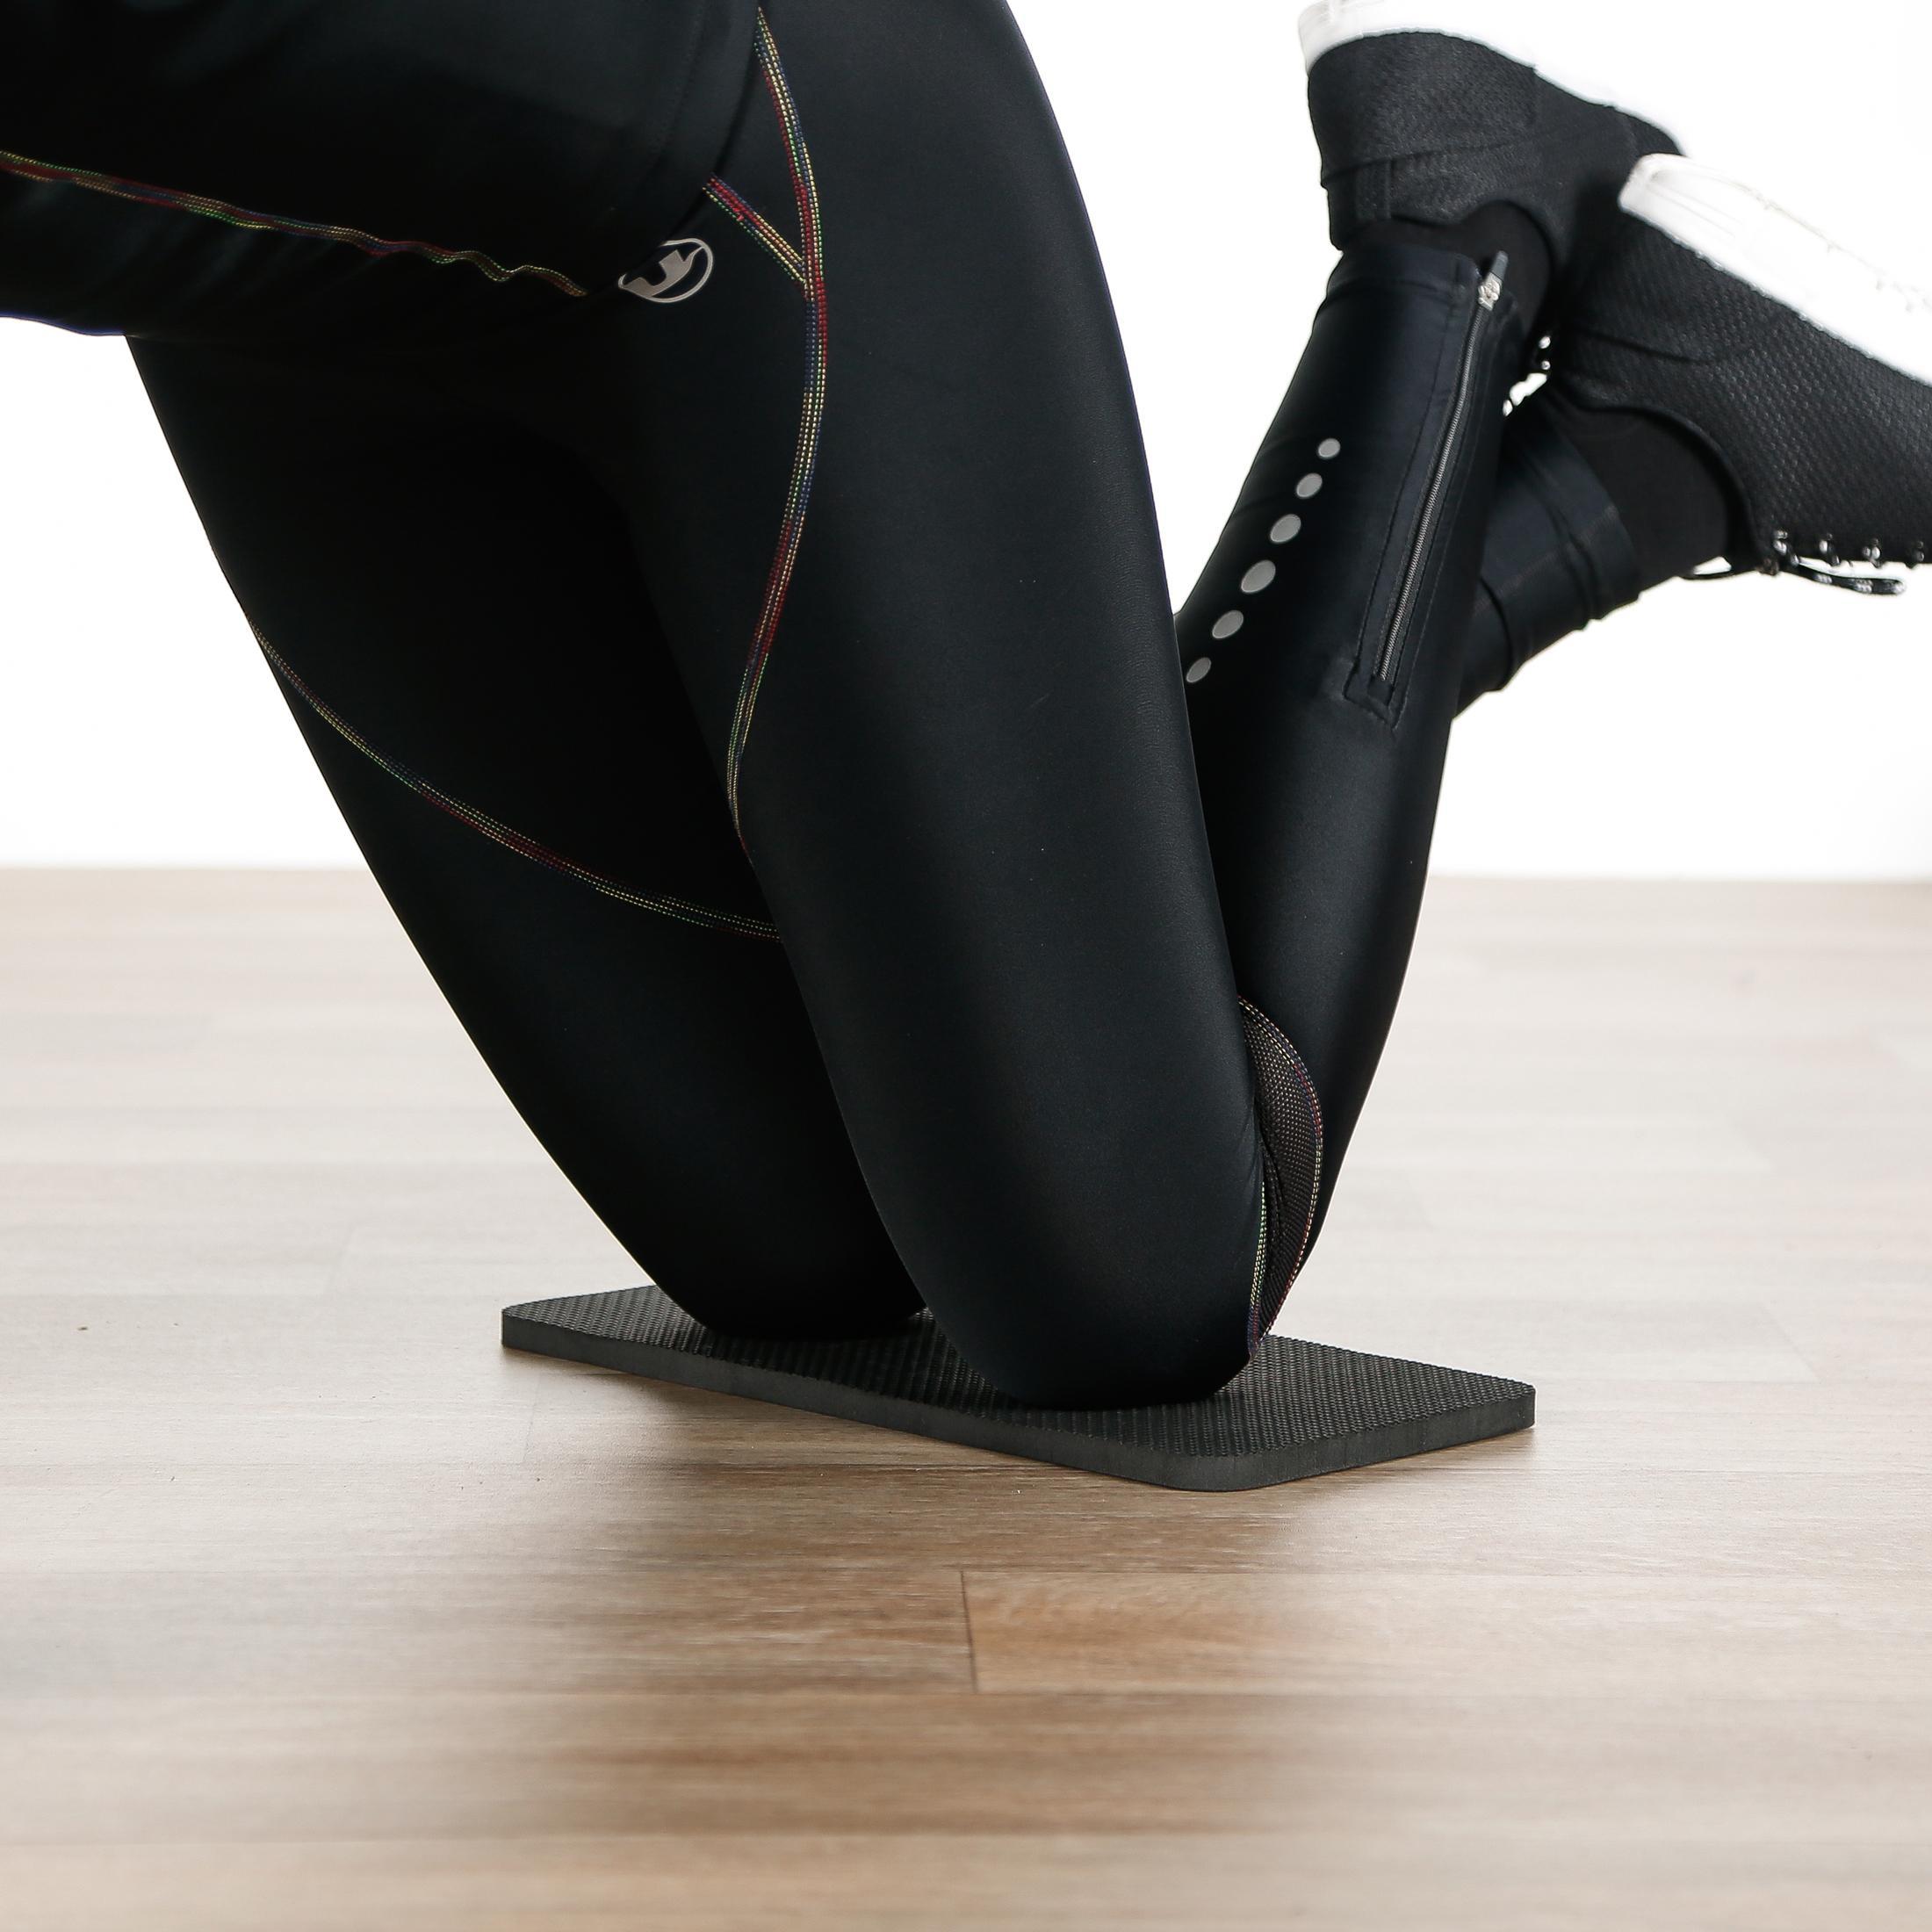 ultrasport bauchtrainer ab wheel platzsparender. Black Bedroom Furniture Sets. Home Design Ideas